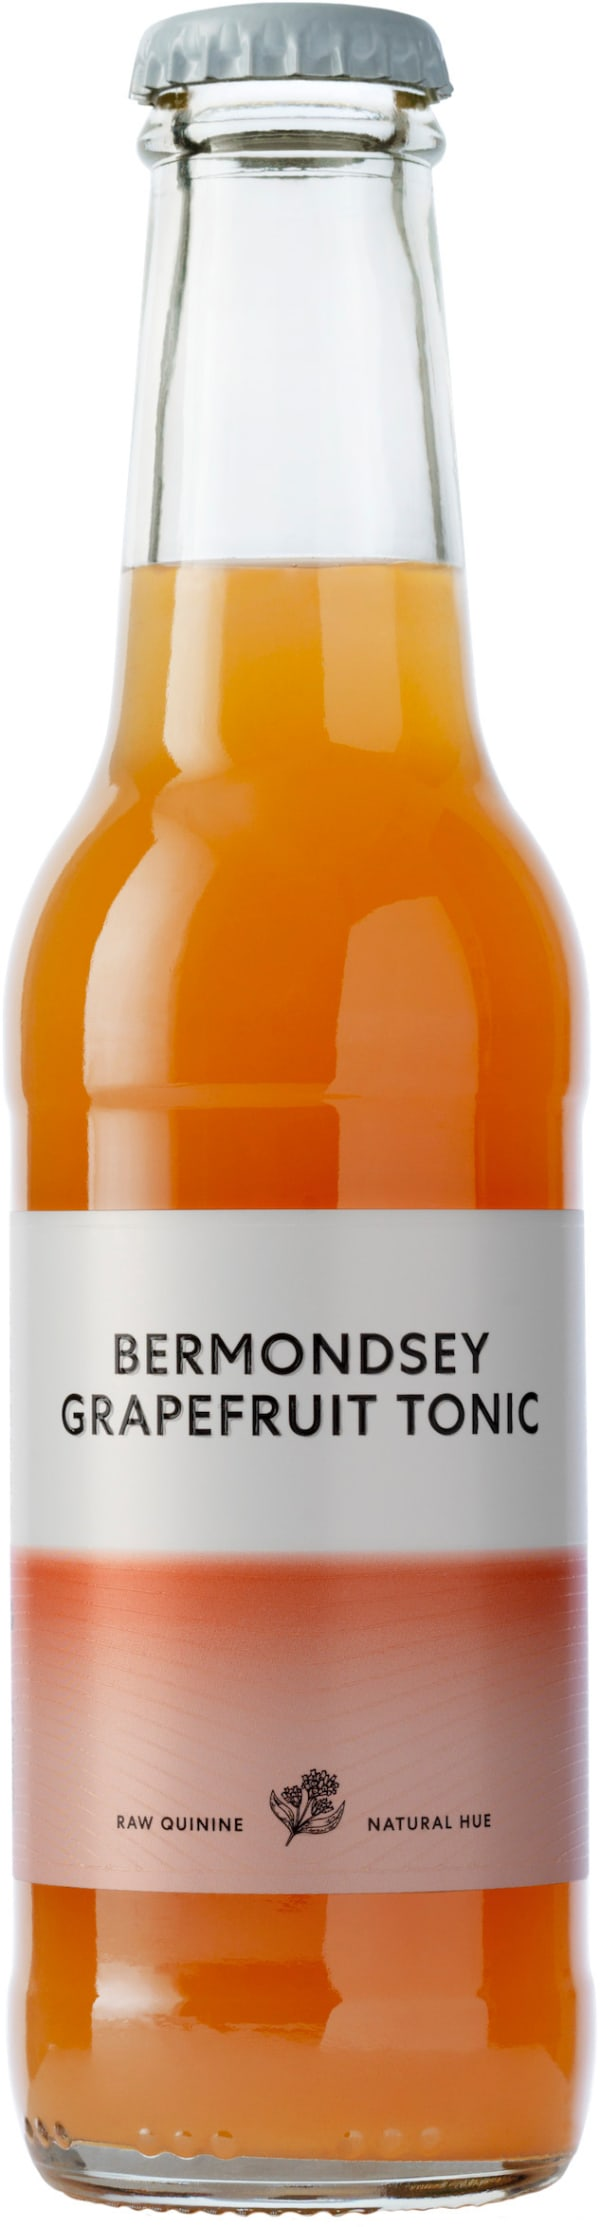 Bermondsey Grapefruit